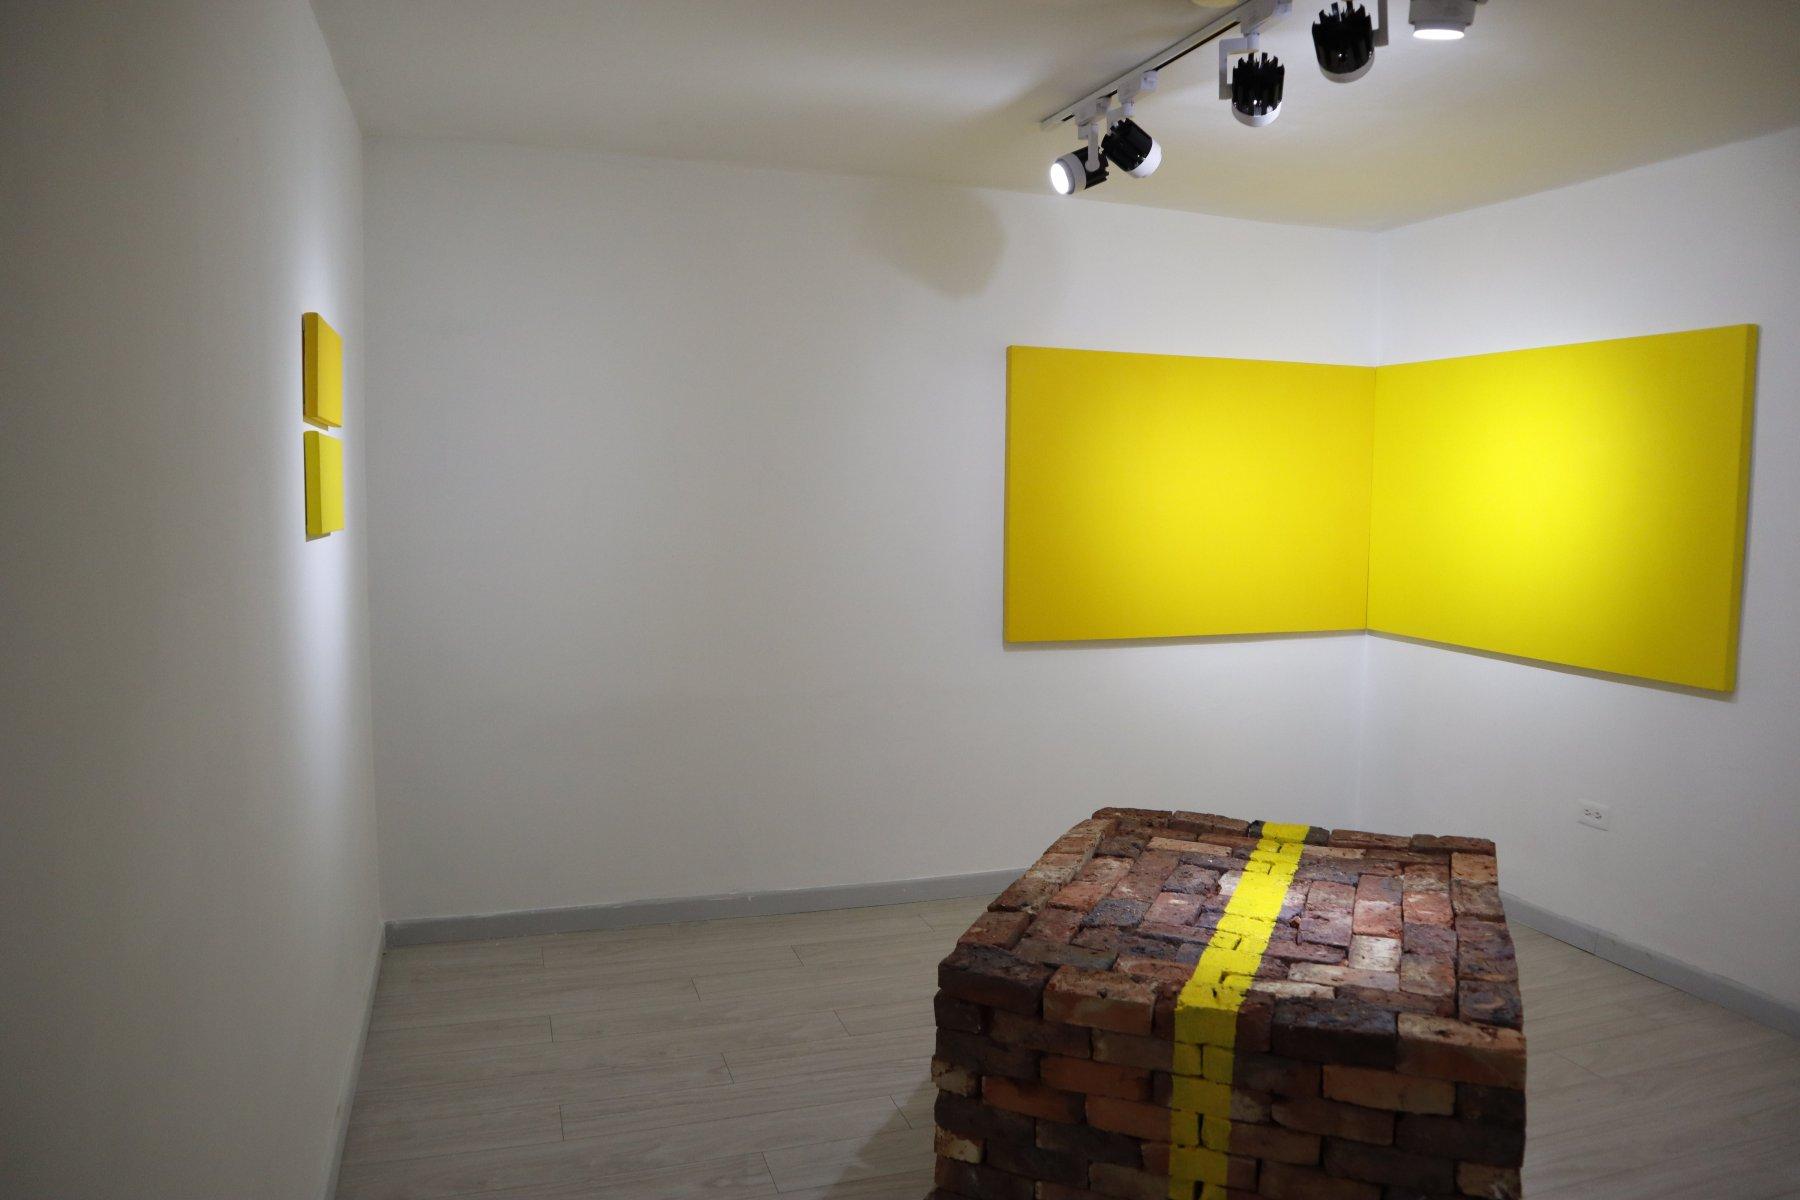 estudio de color fronterizo (2018) - Leo Moyano